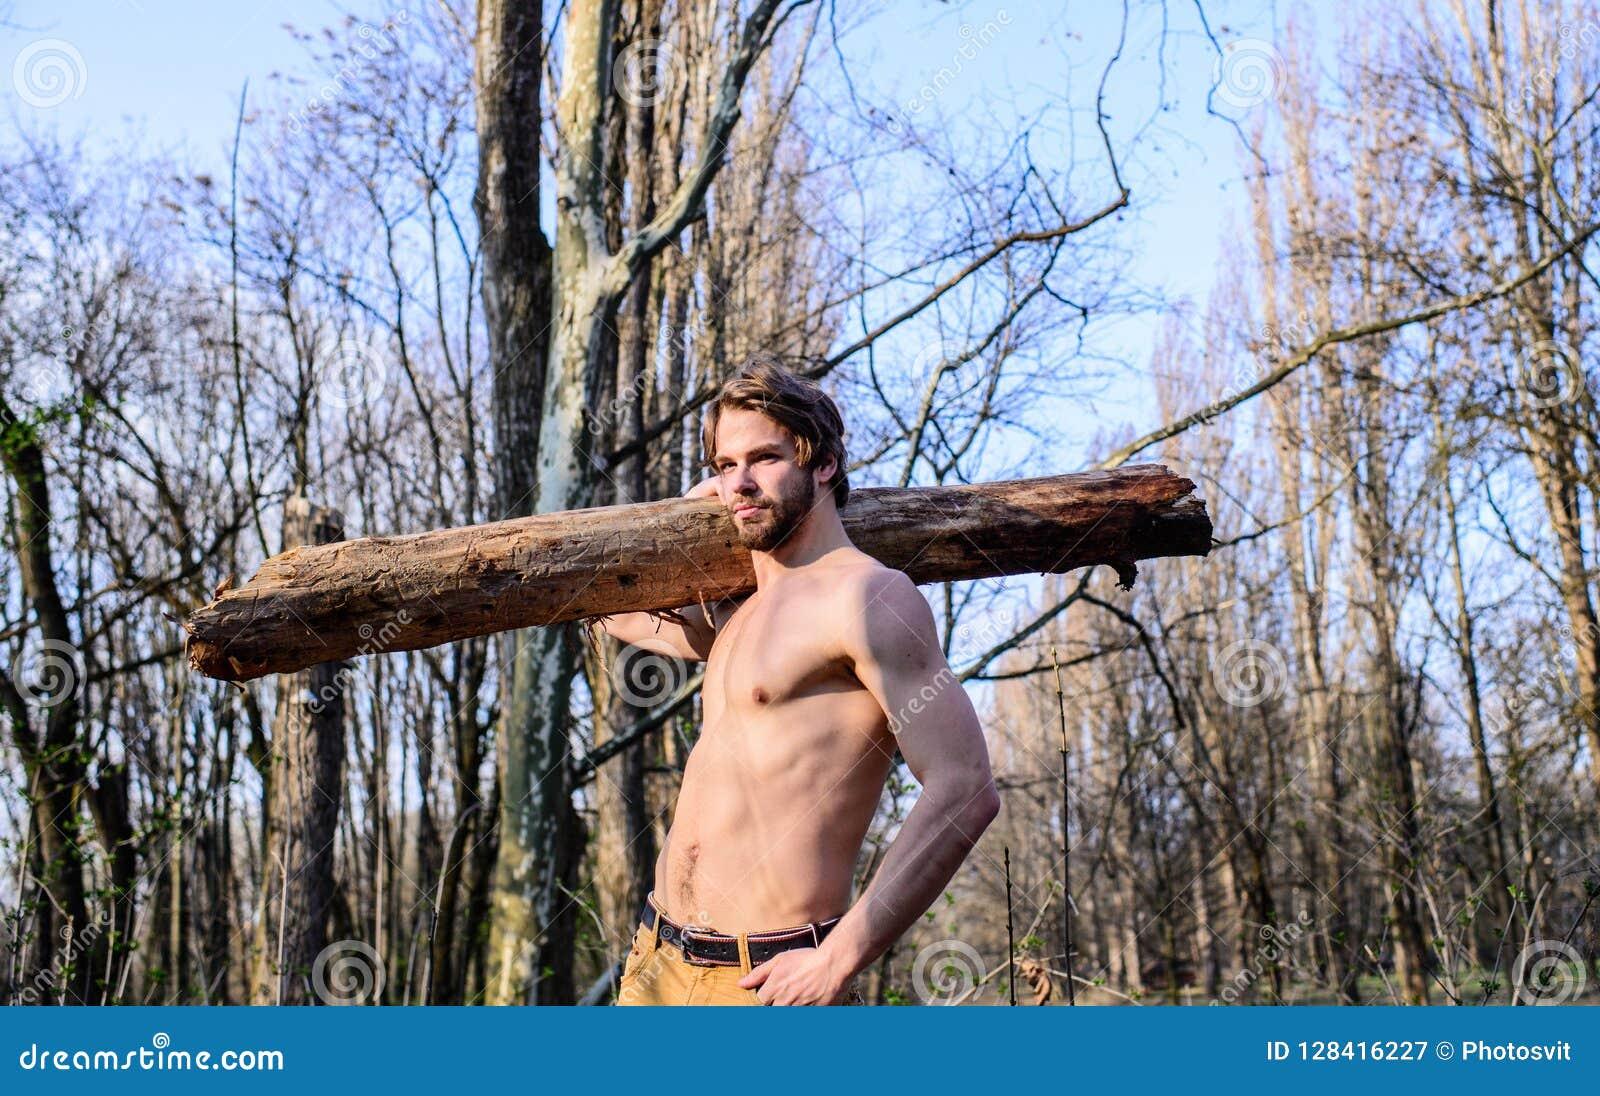 Lumberjack or woodman naked muscular torso gathering wood. Man brutal  lumberjack carry big log on shoulder.